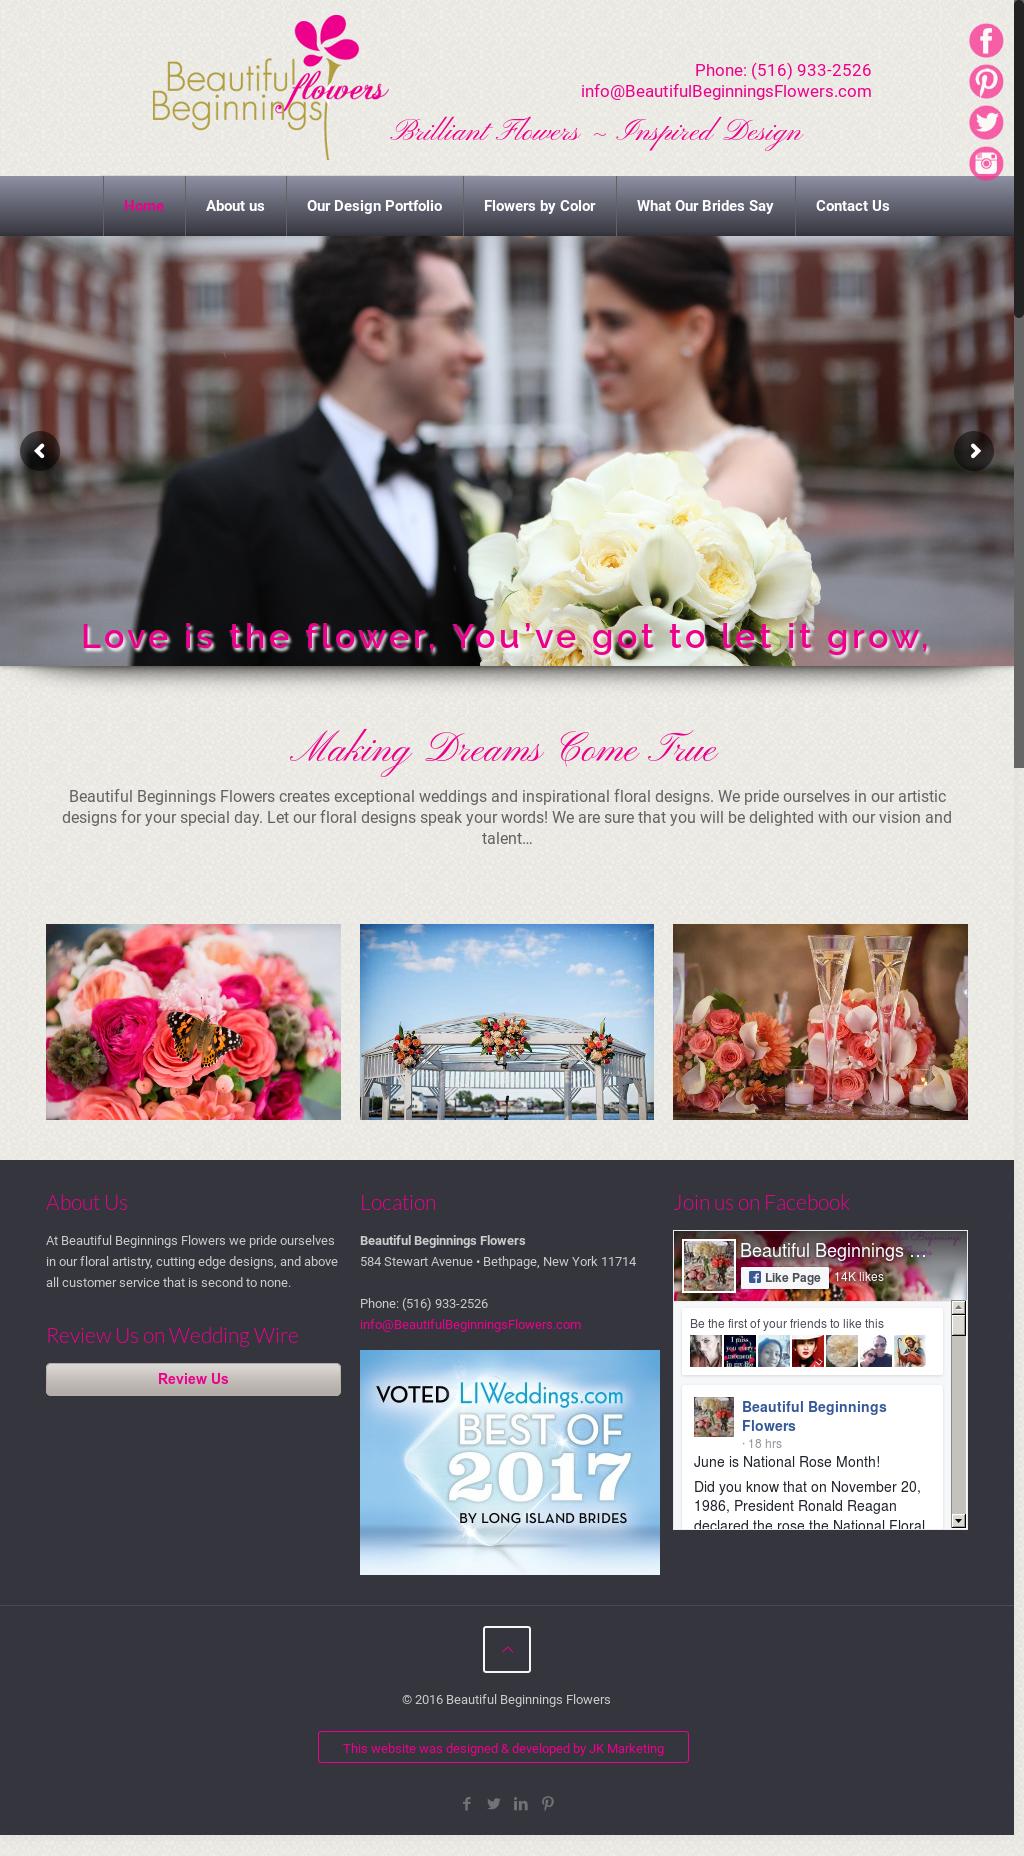 Beautiful beginnings flowers competitors revenue and employees beautiful beginnings flowers website history izmirmasajfo